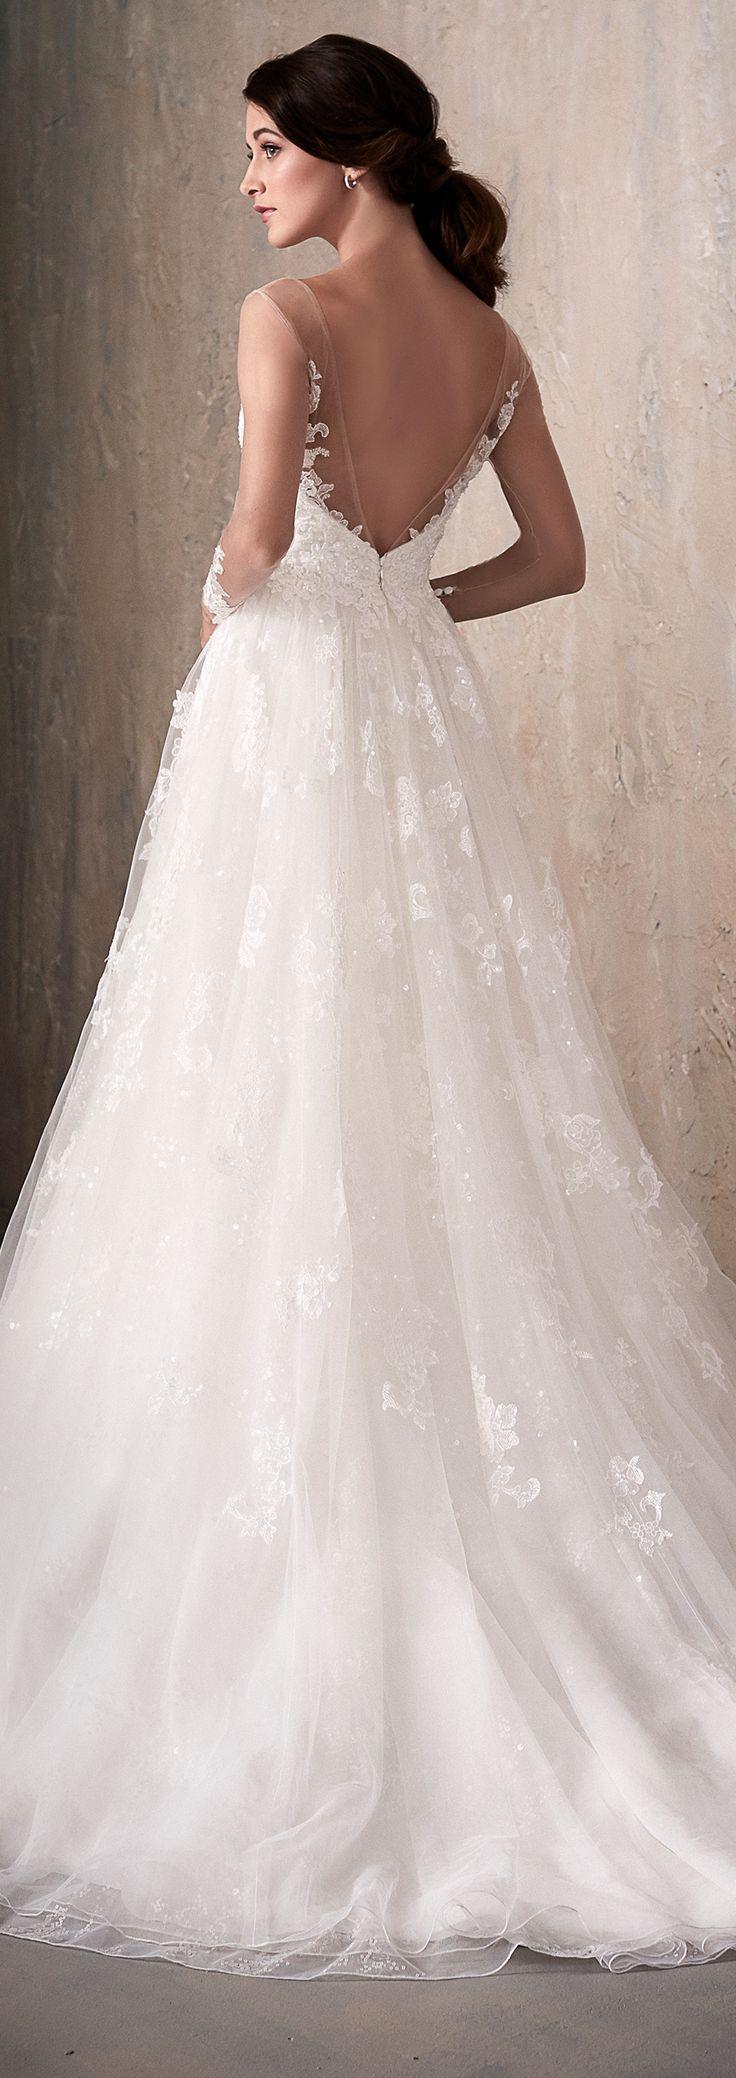 Lace Wedding Dress by Adrianna Papell Platinum   @HouseofWuBrands #AdriannaPapellPlatinum #AdriannaPapell #HouseofWu